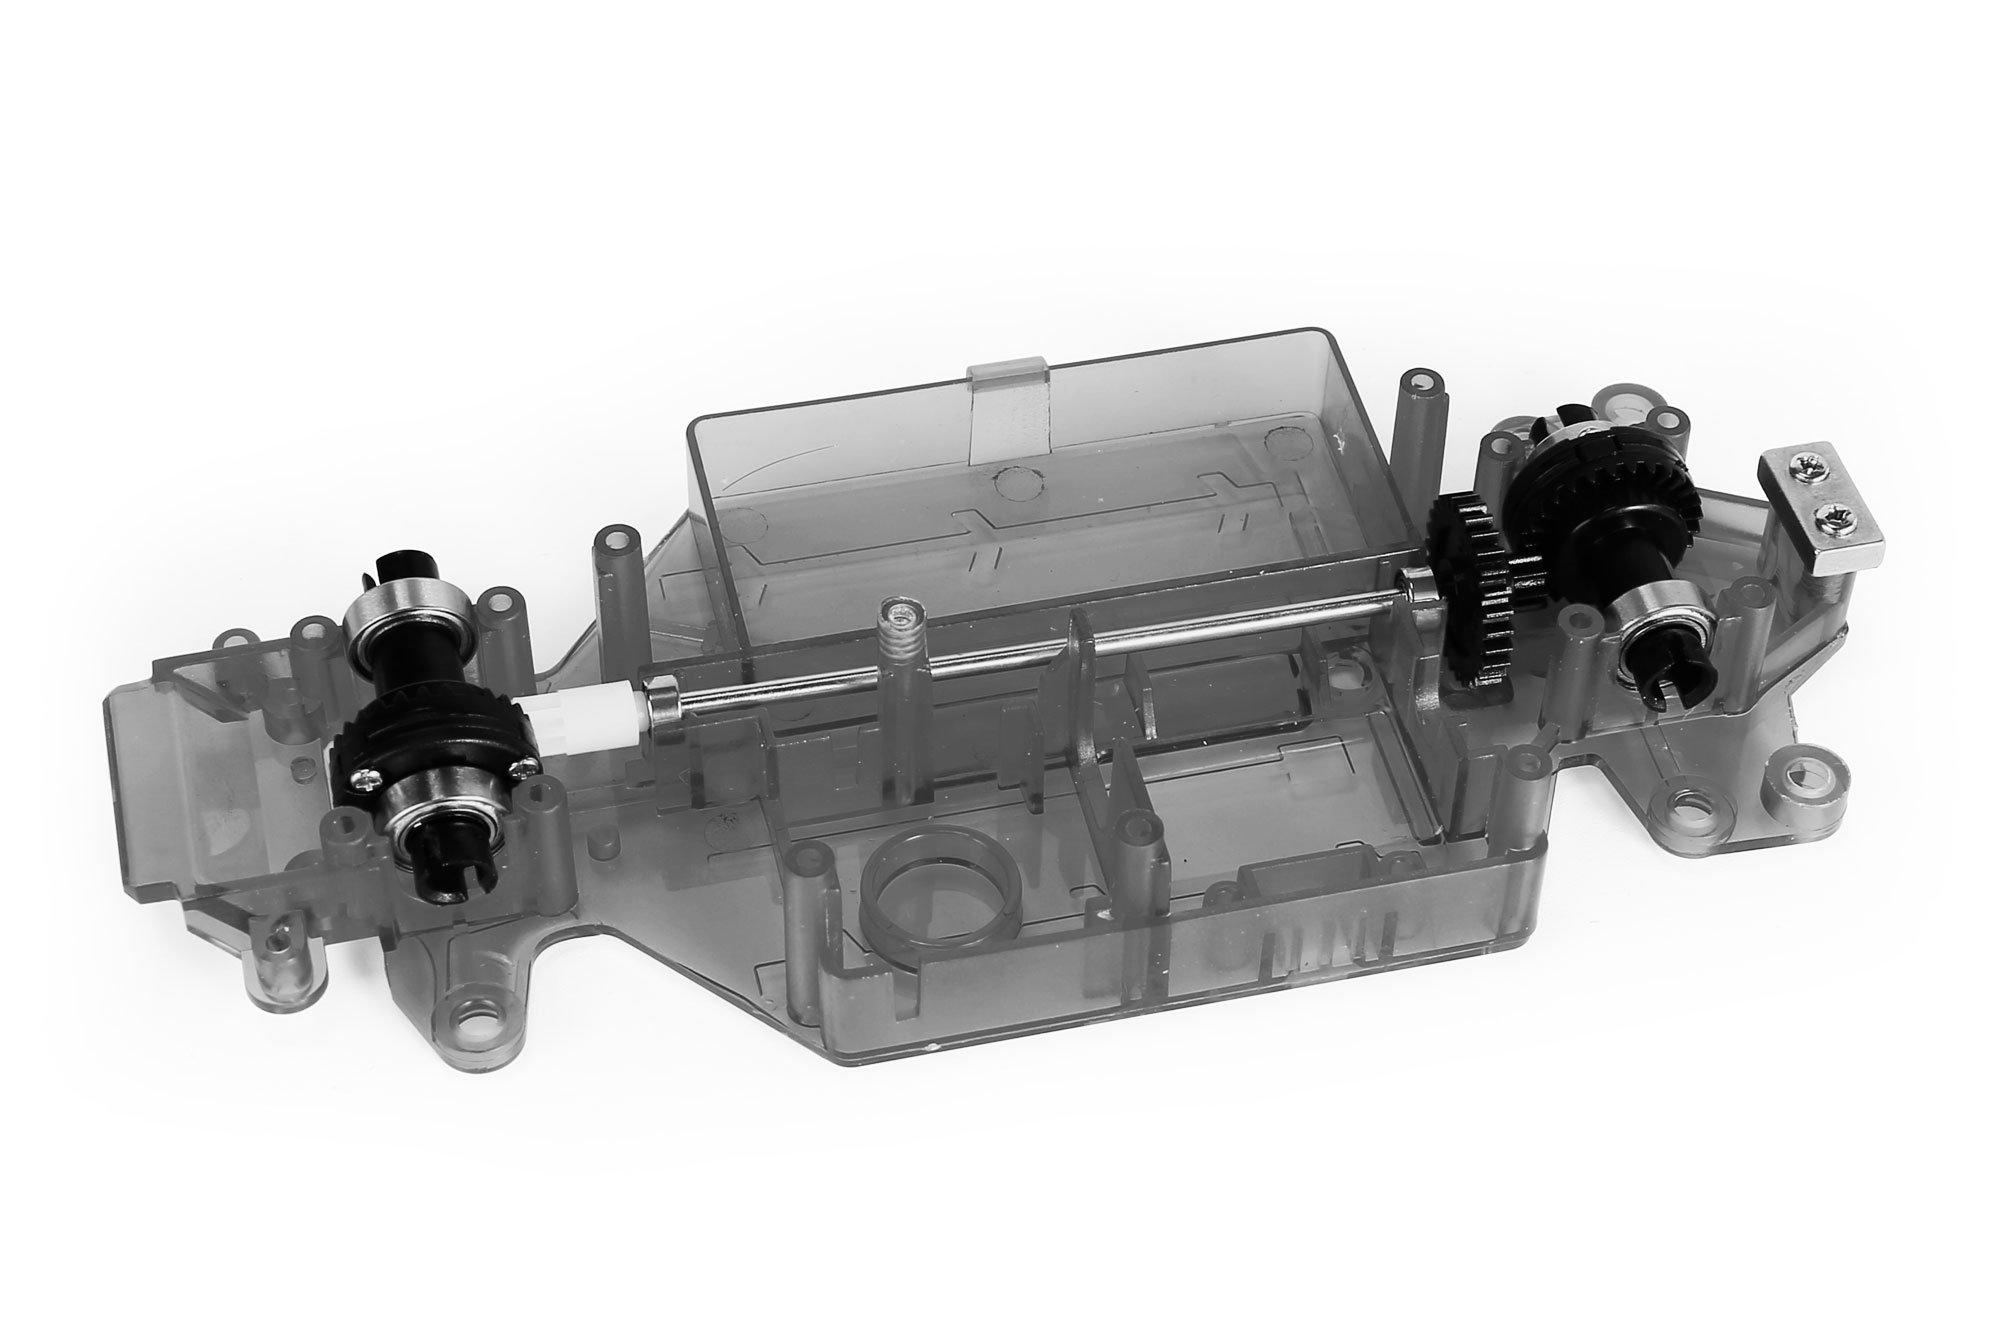 Rage RC Mini Q DIY Kit - Chassis